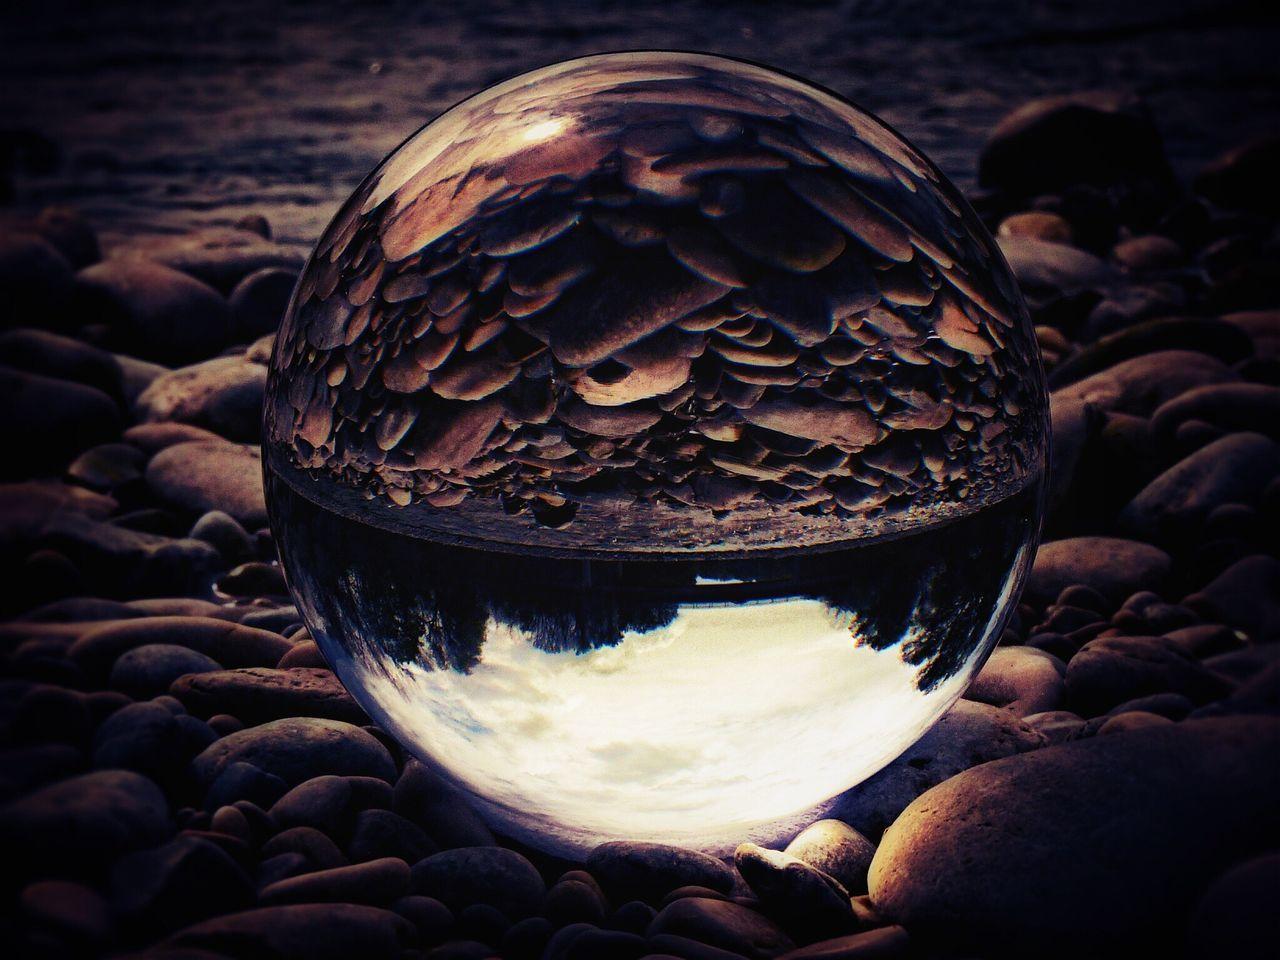 GlasReflection Close-up No People Day Nature Stone Reflections Glasssphere Fotography Glass Art Kreativ